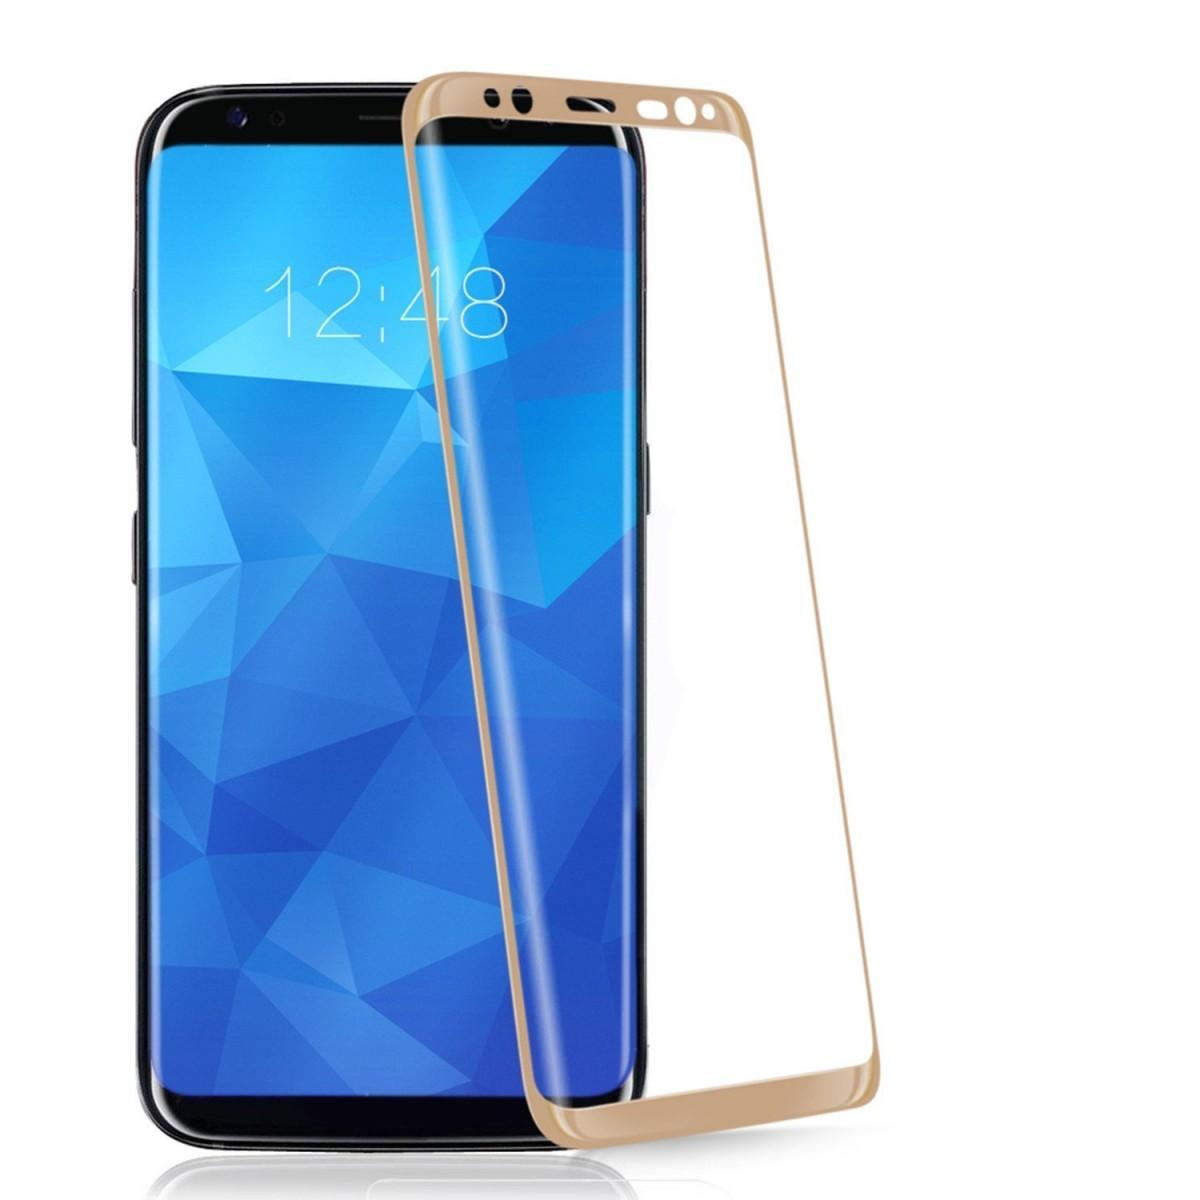 3D Tvrzené sklo 9H na celý displej pro Galaxy S8 Plus (S8+) - Zlaté (gold)